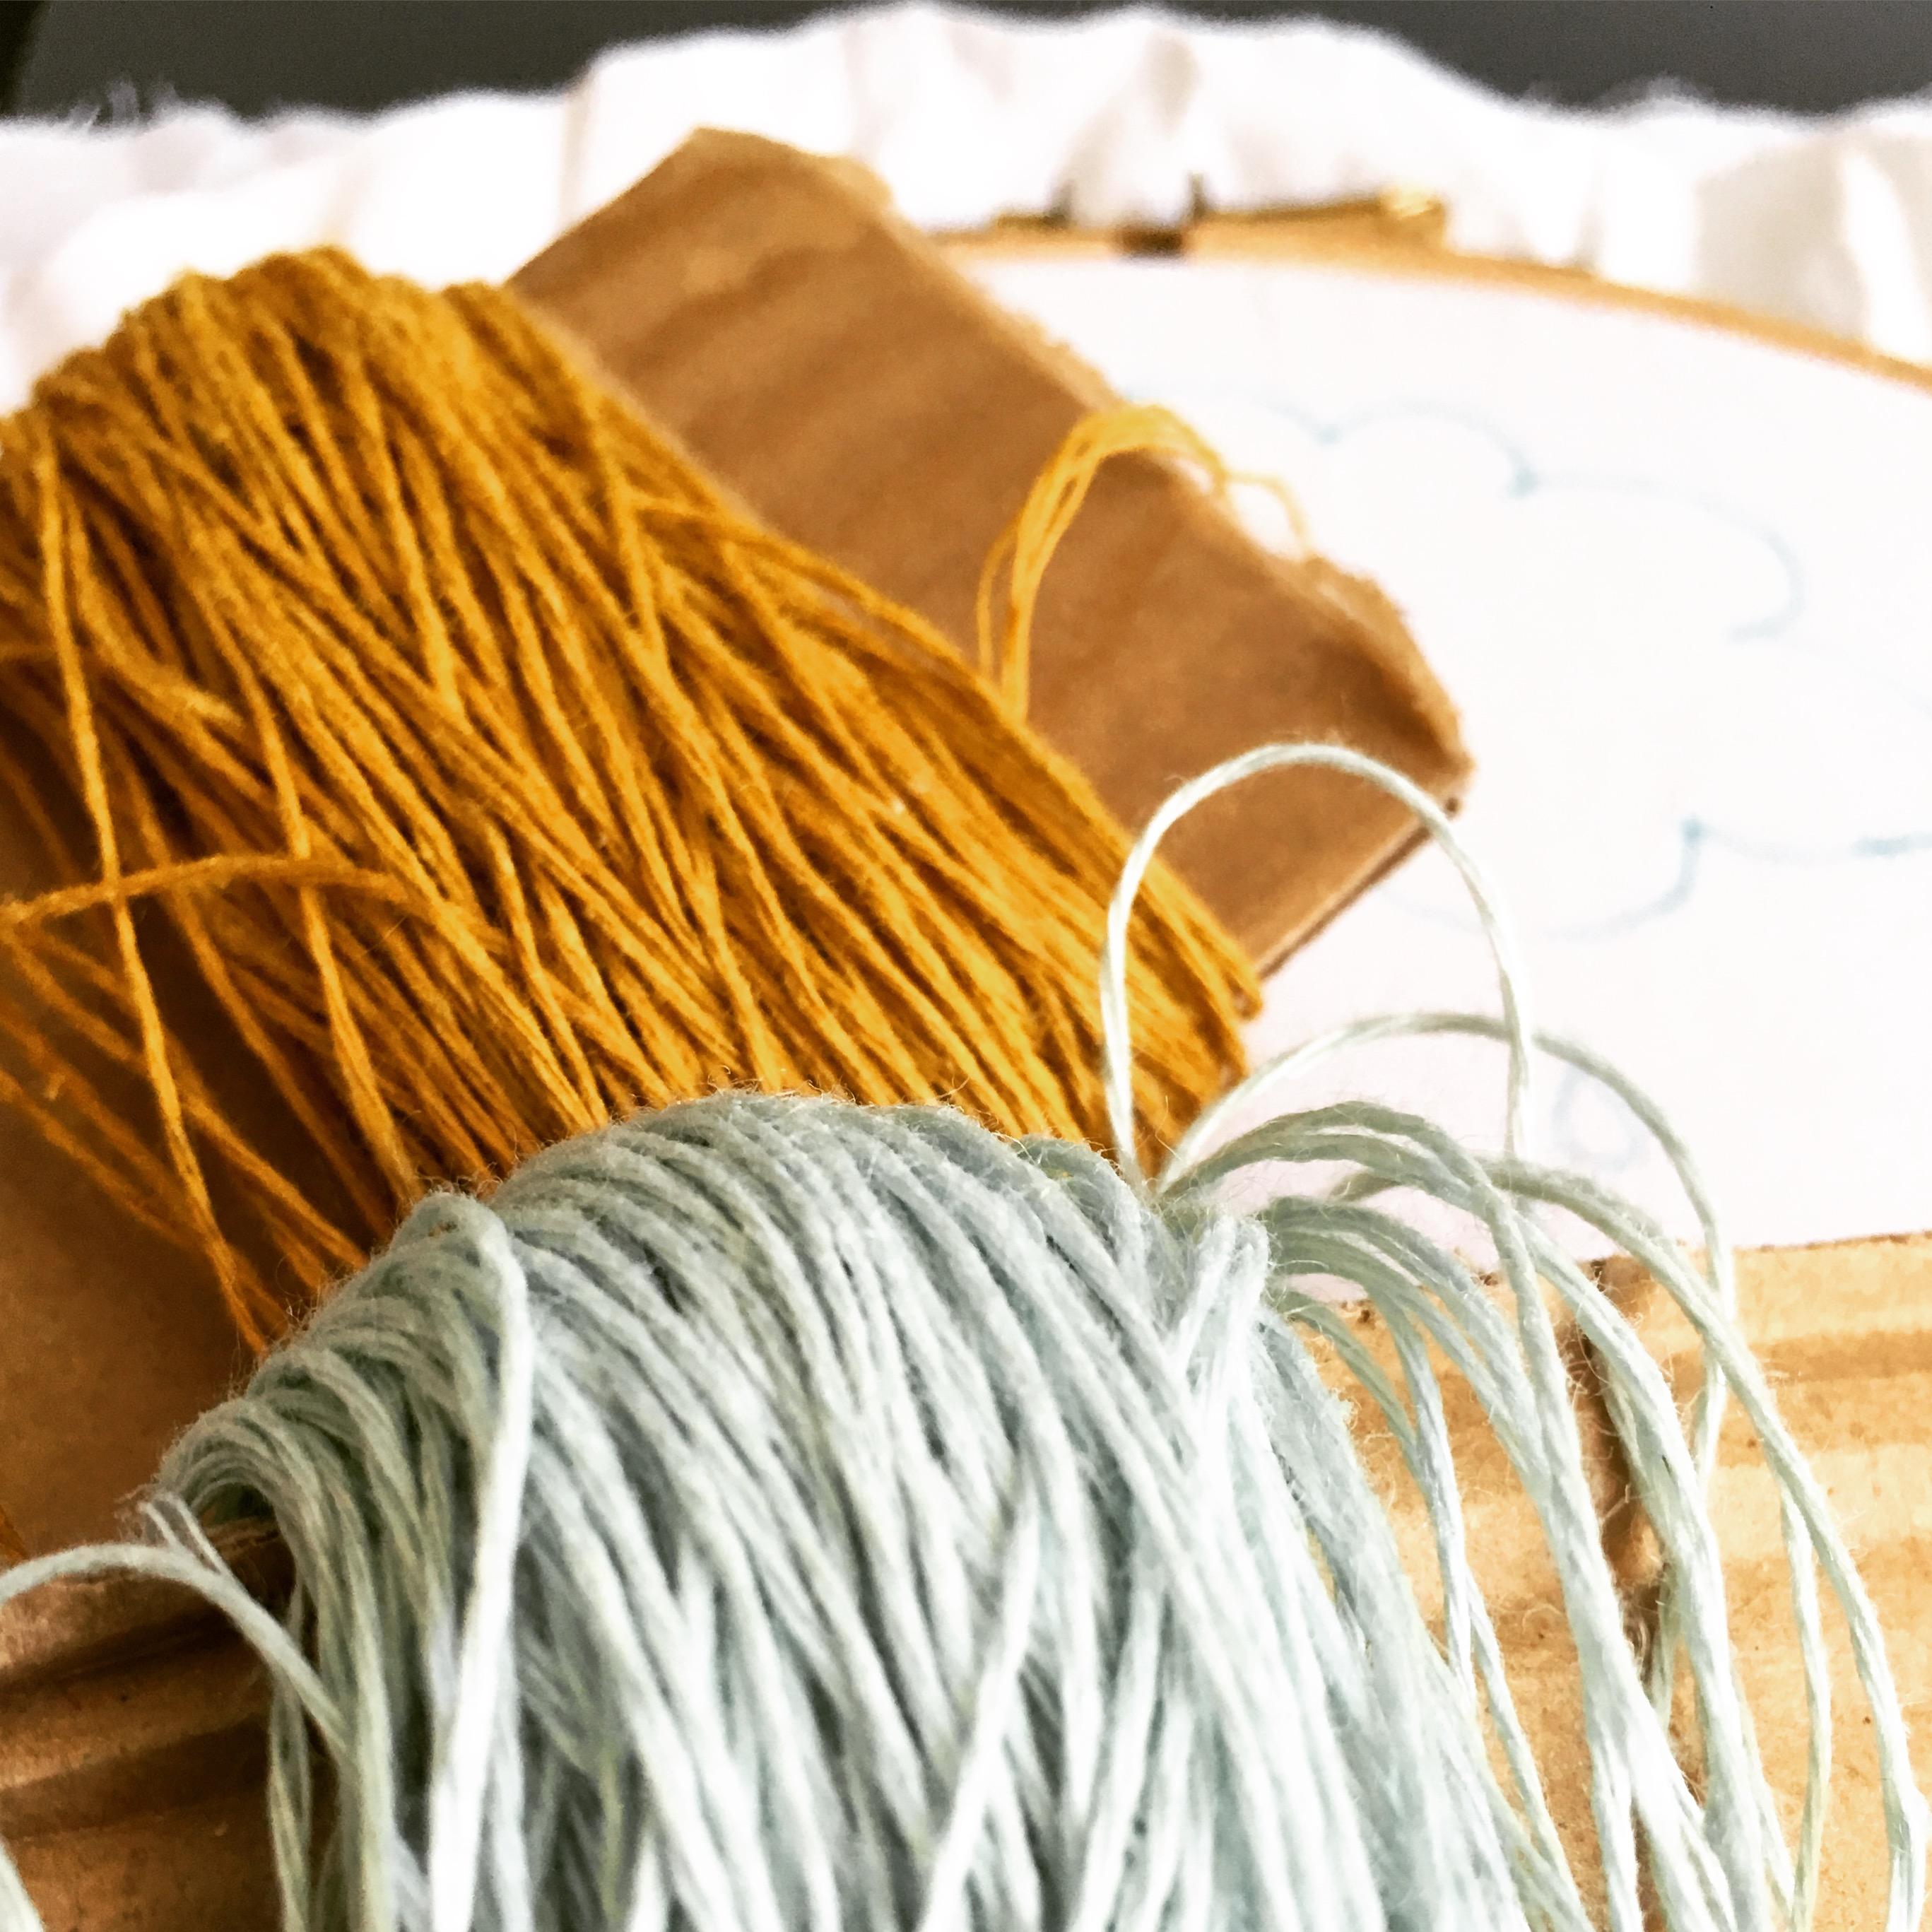 Purlwise linen mini skeins ready to start stitching!